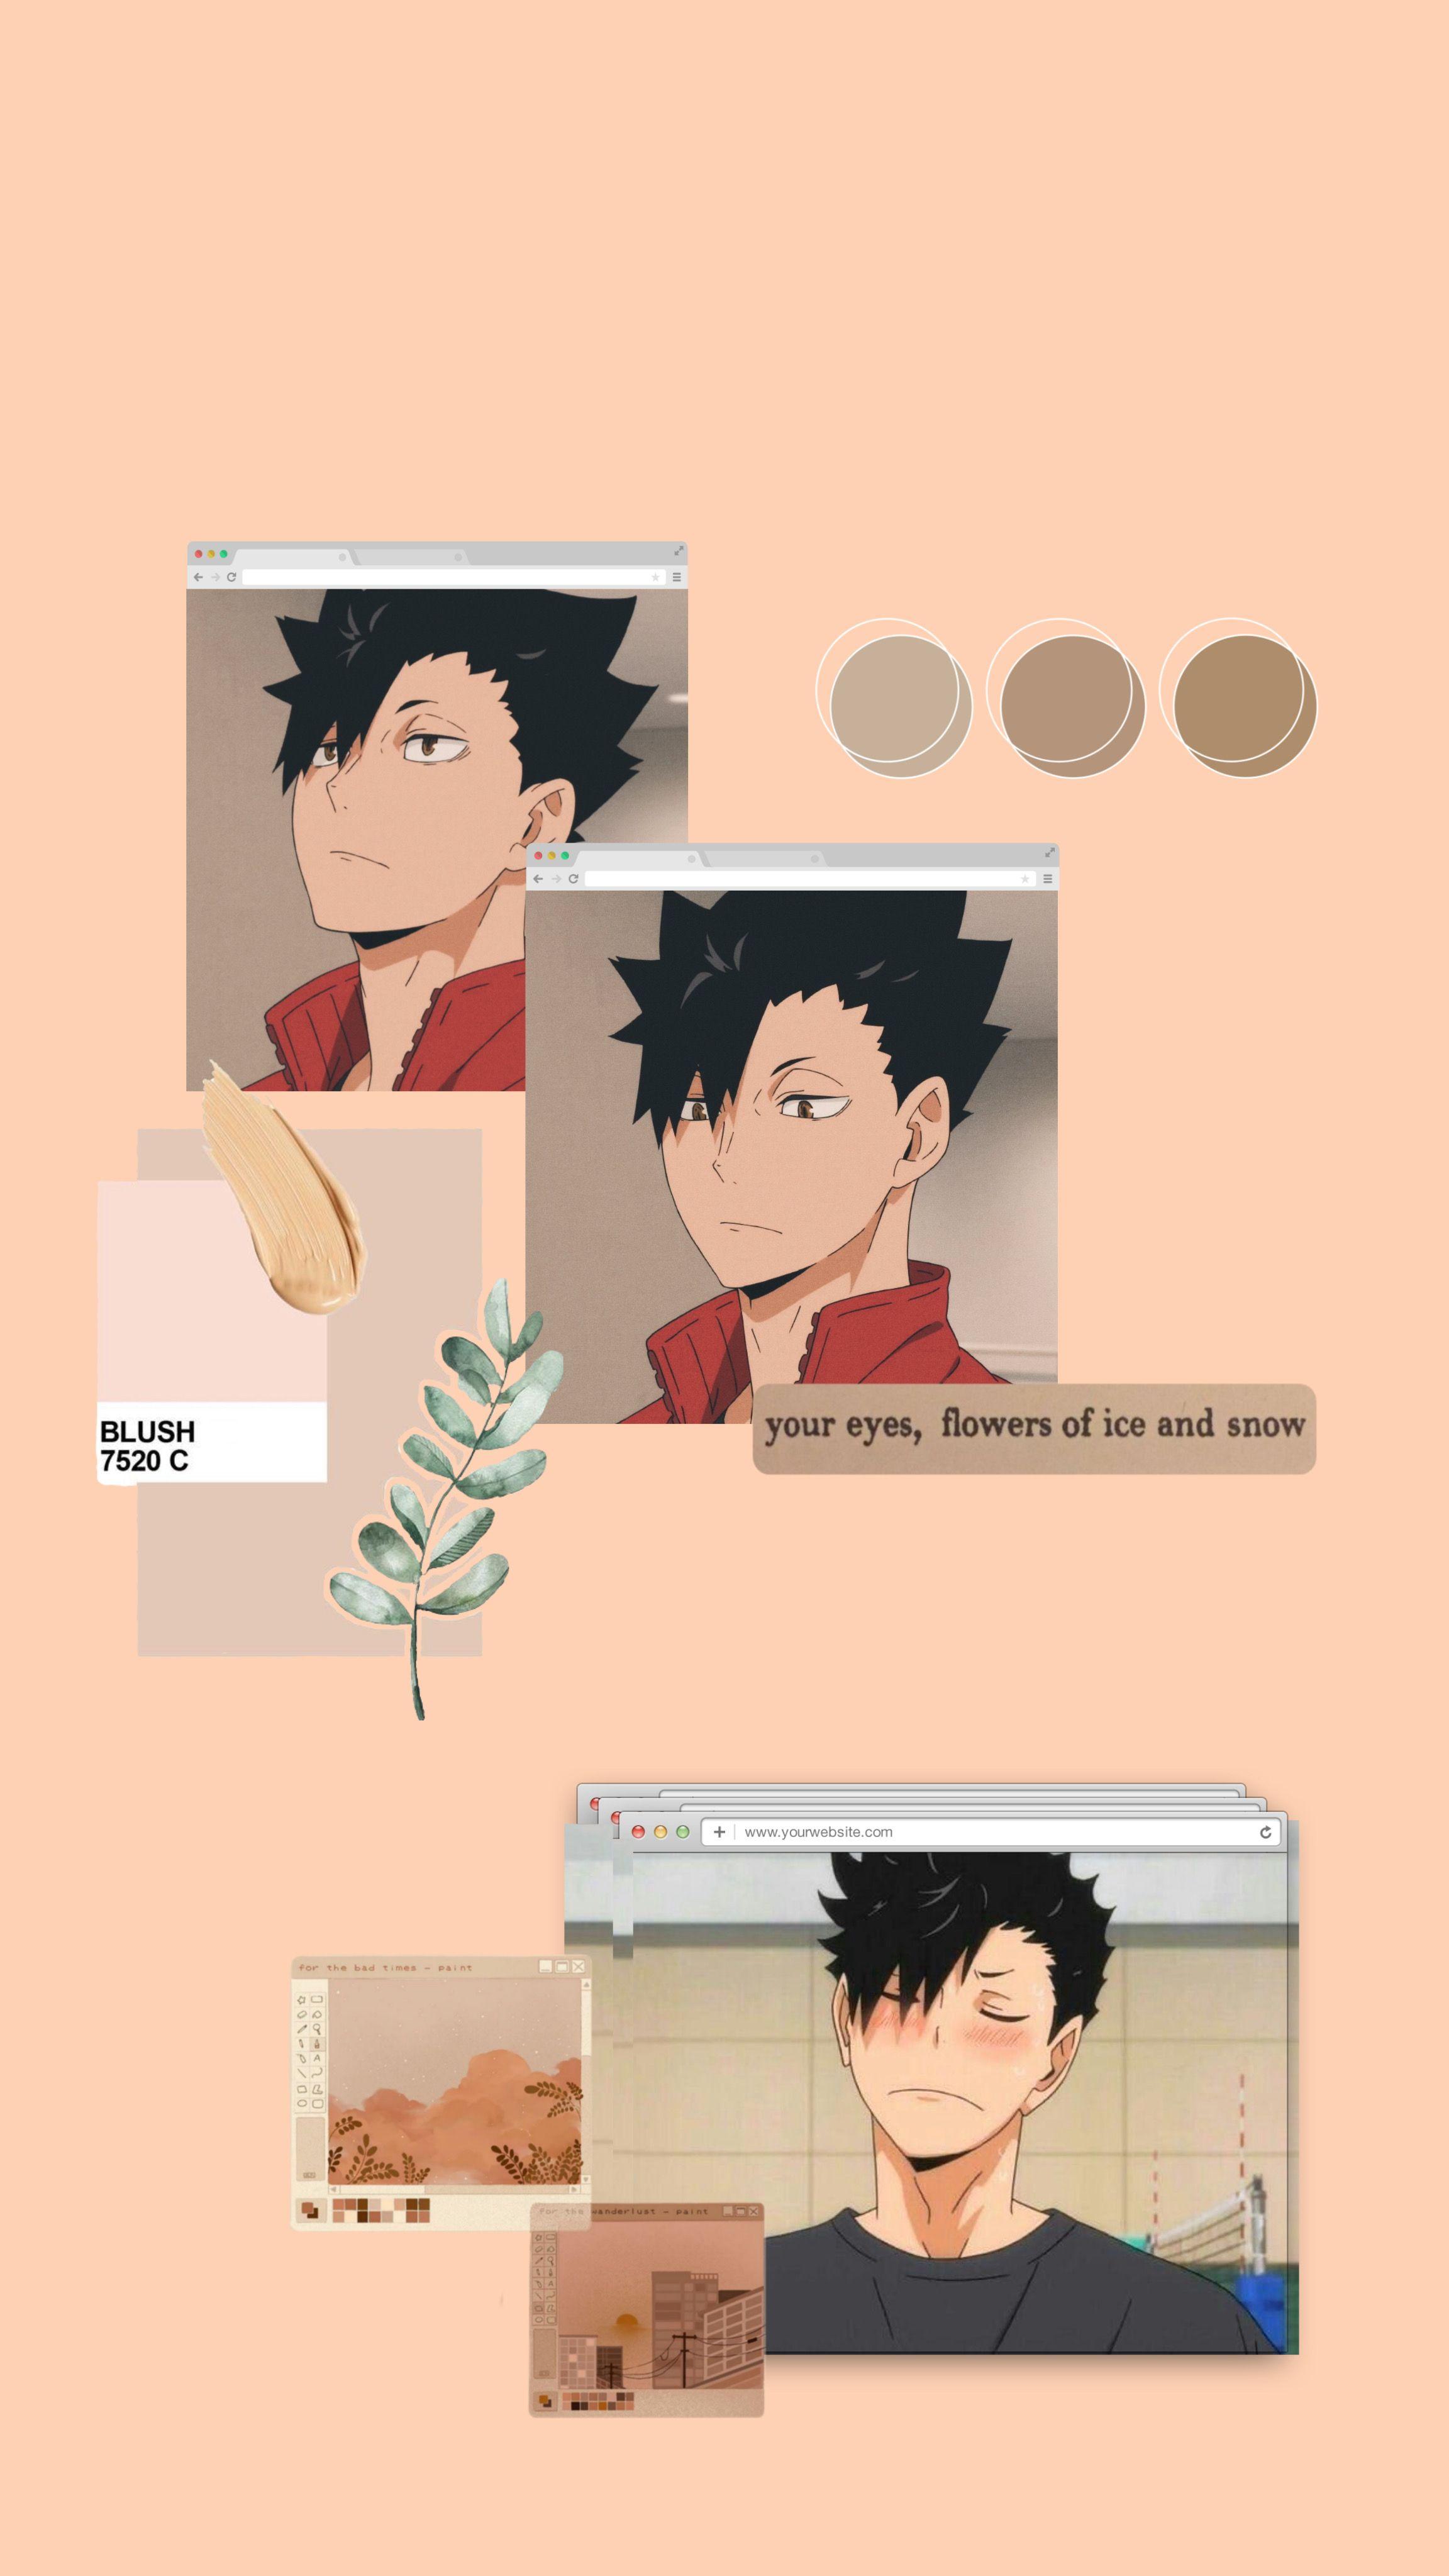 Kuroo Tetsurou Wallpaper Cute Anime Wallpaper Anime Wallpaper Haikyuu Anime